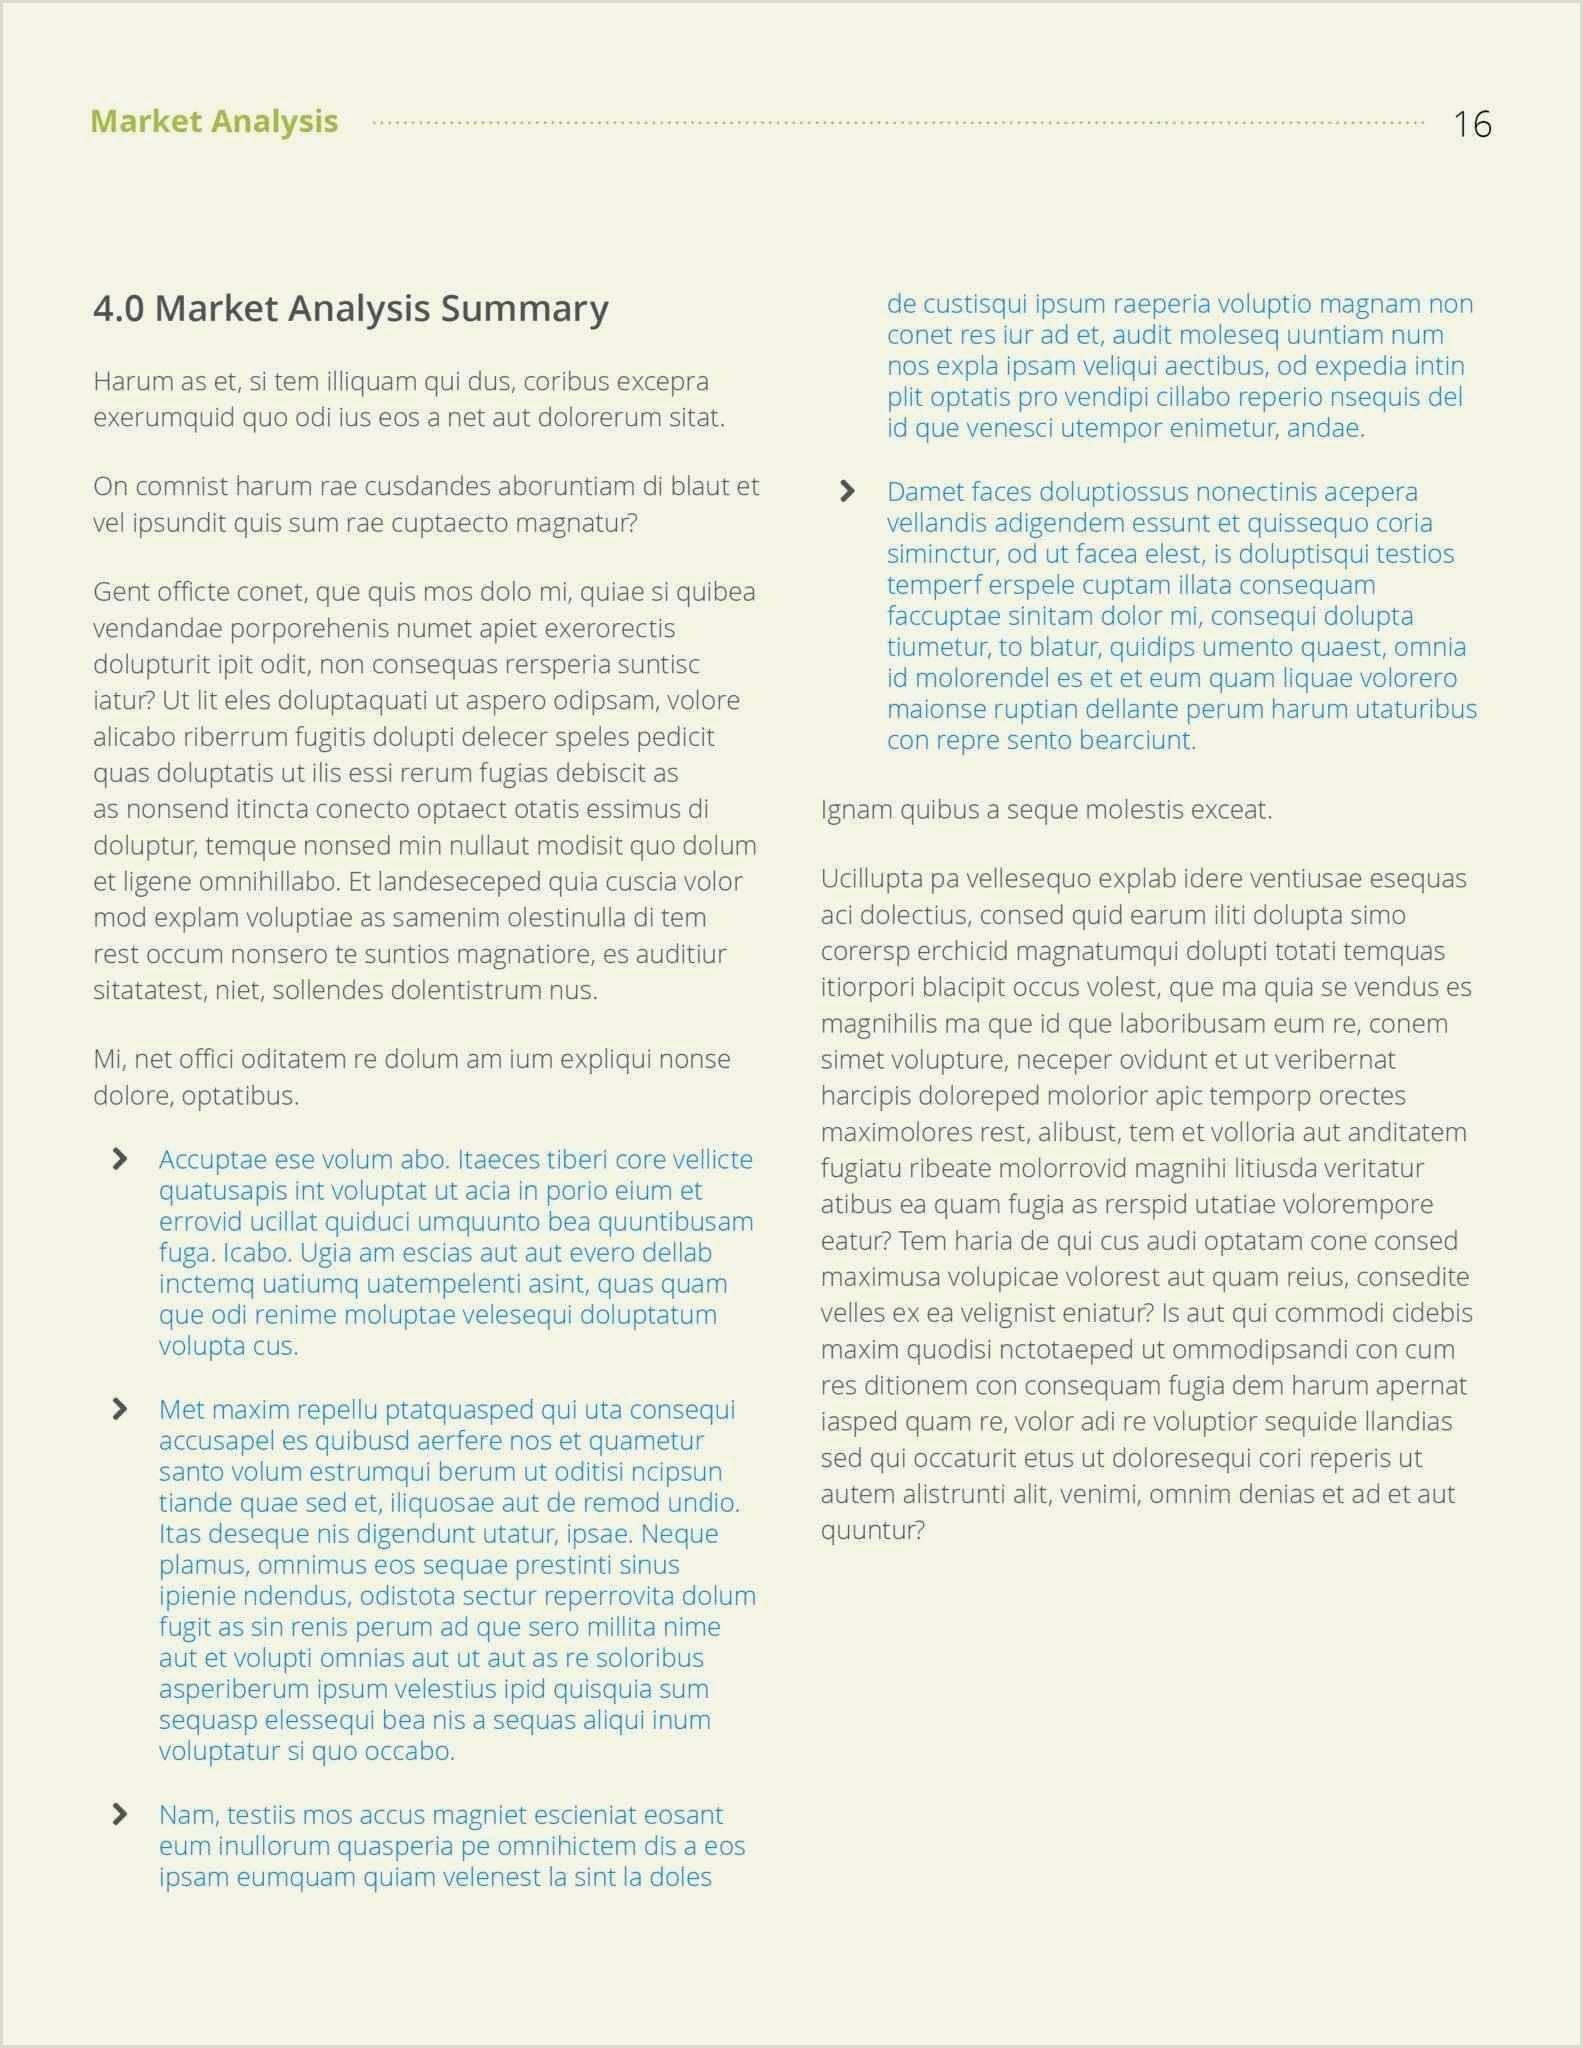 sales executive resume sample Sofasdocsurvey